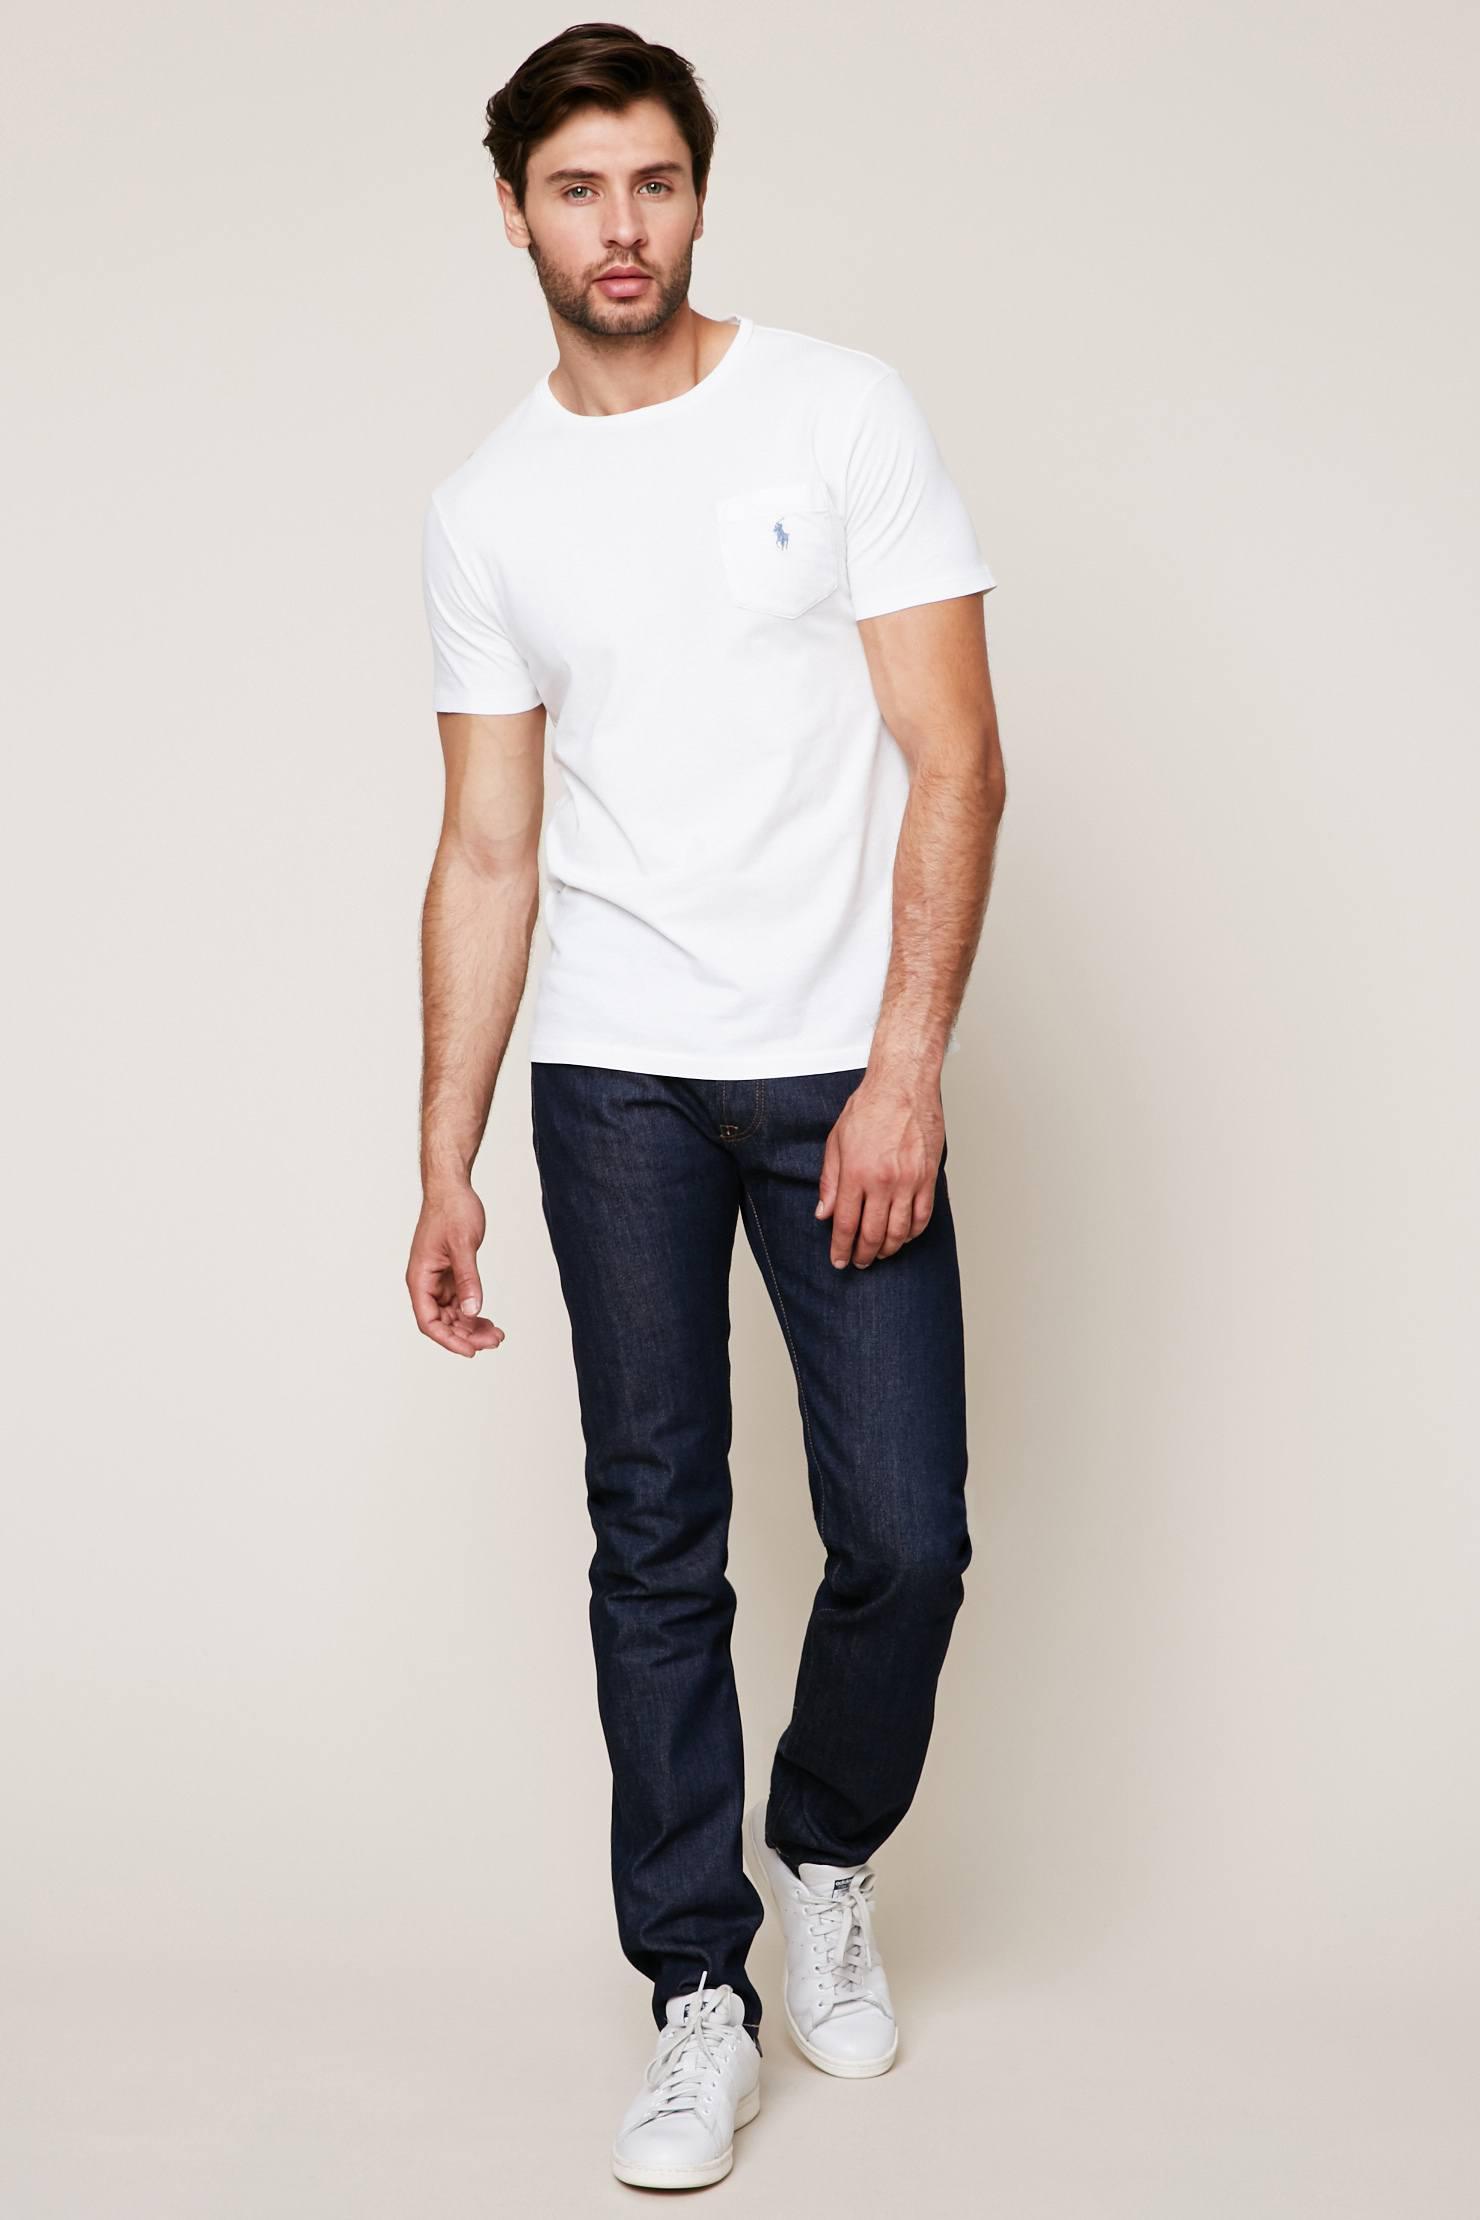 lyst polo ralph lauren t shirt in white for men. Black Bedroom Furniture Sets. Home Design Ideas